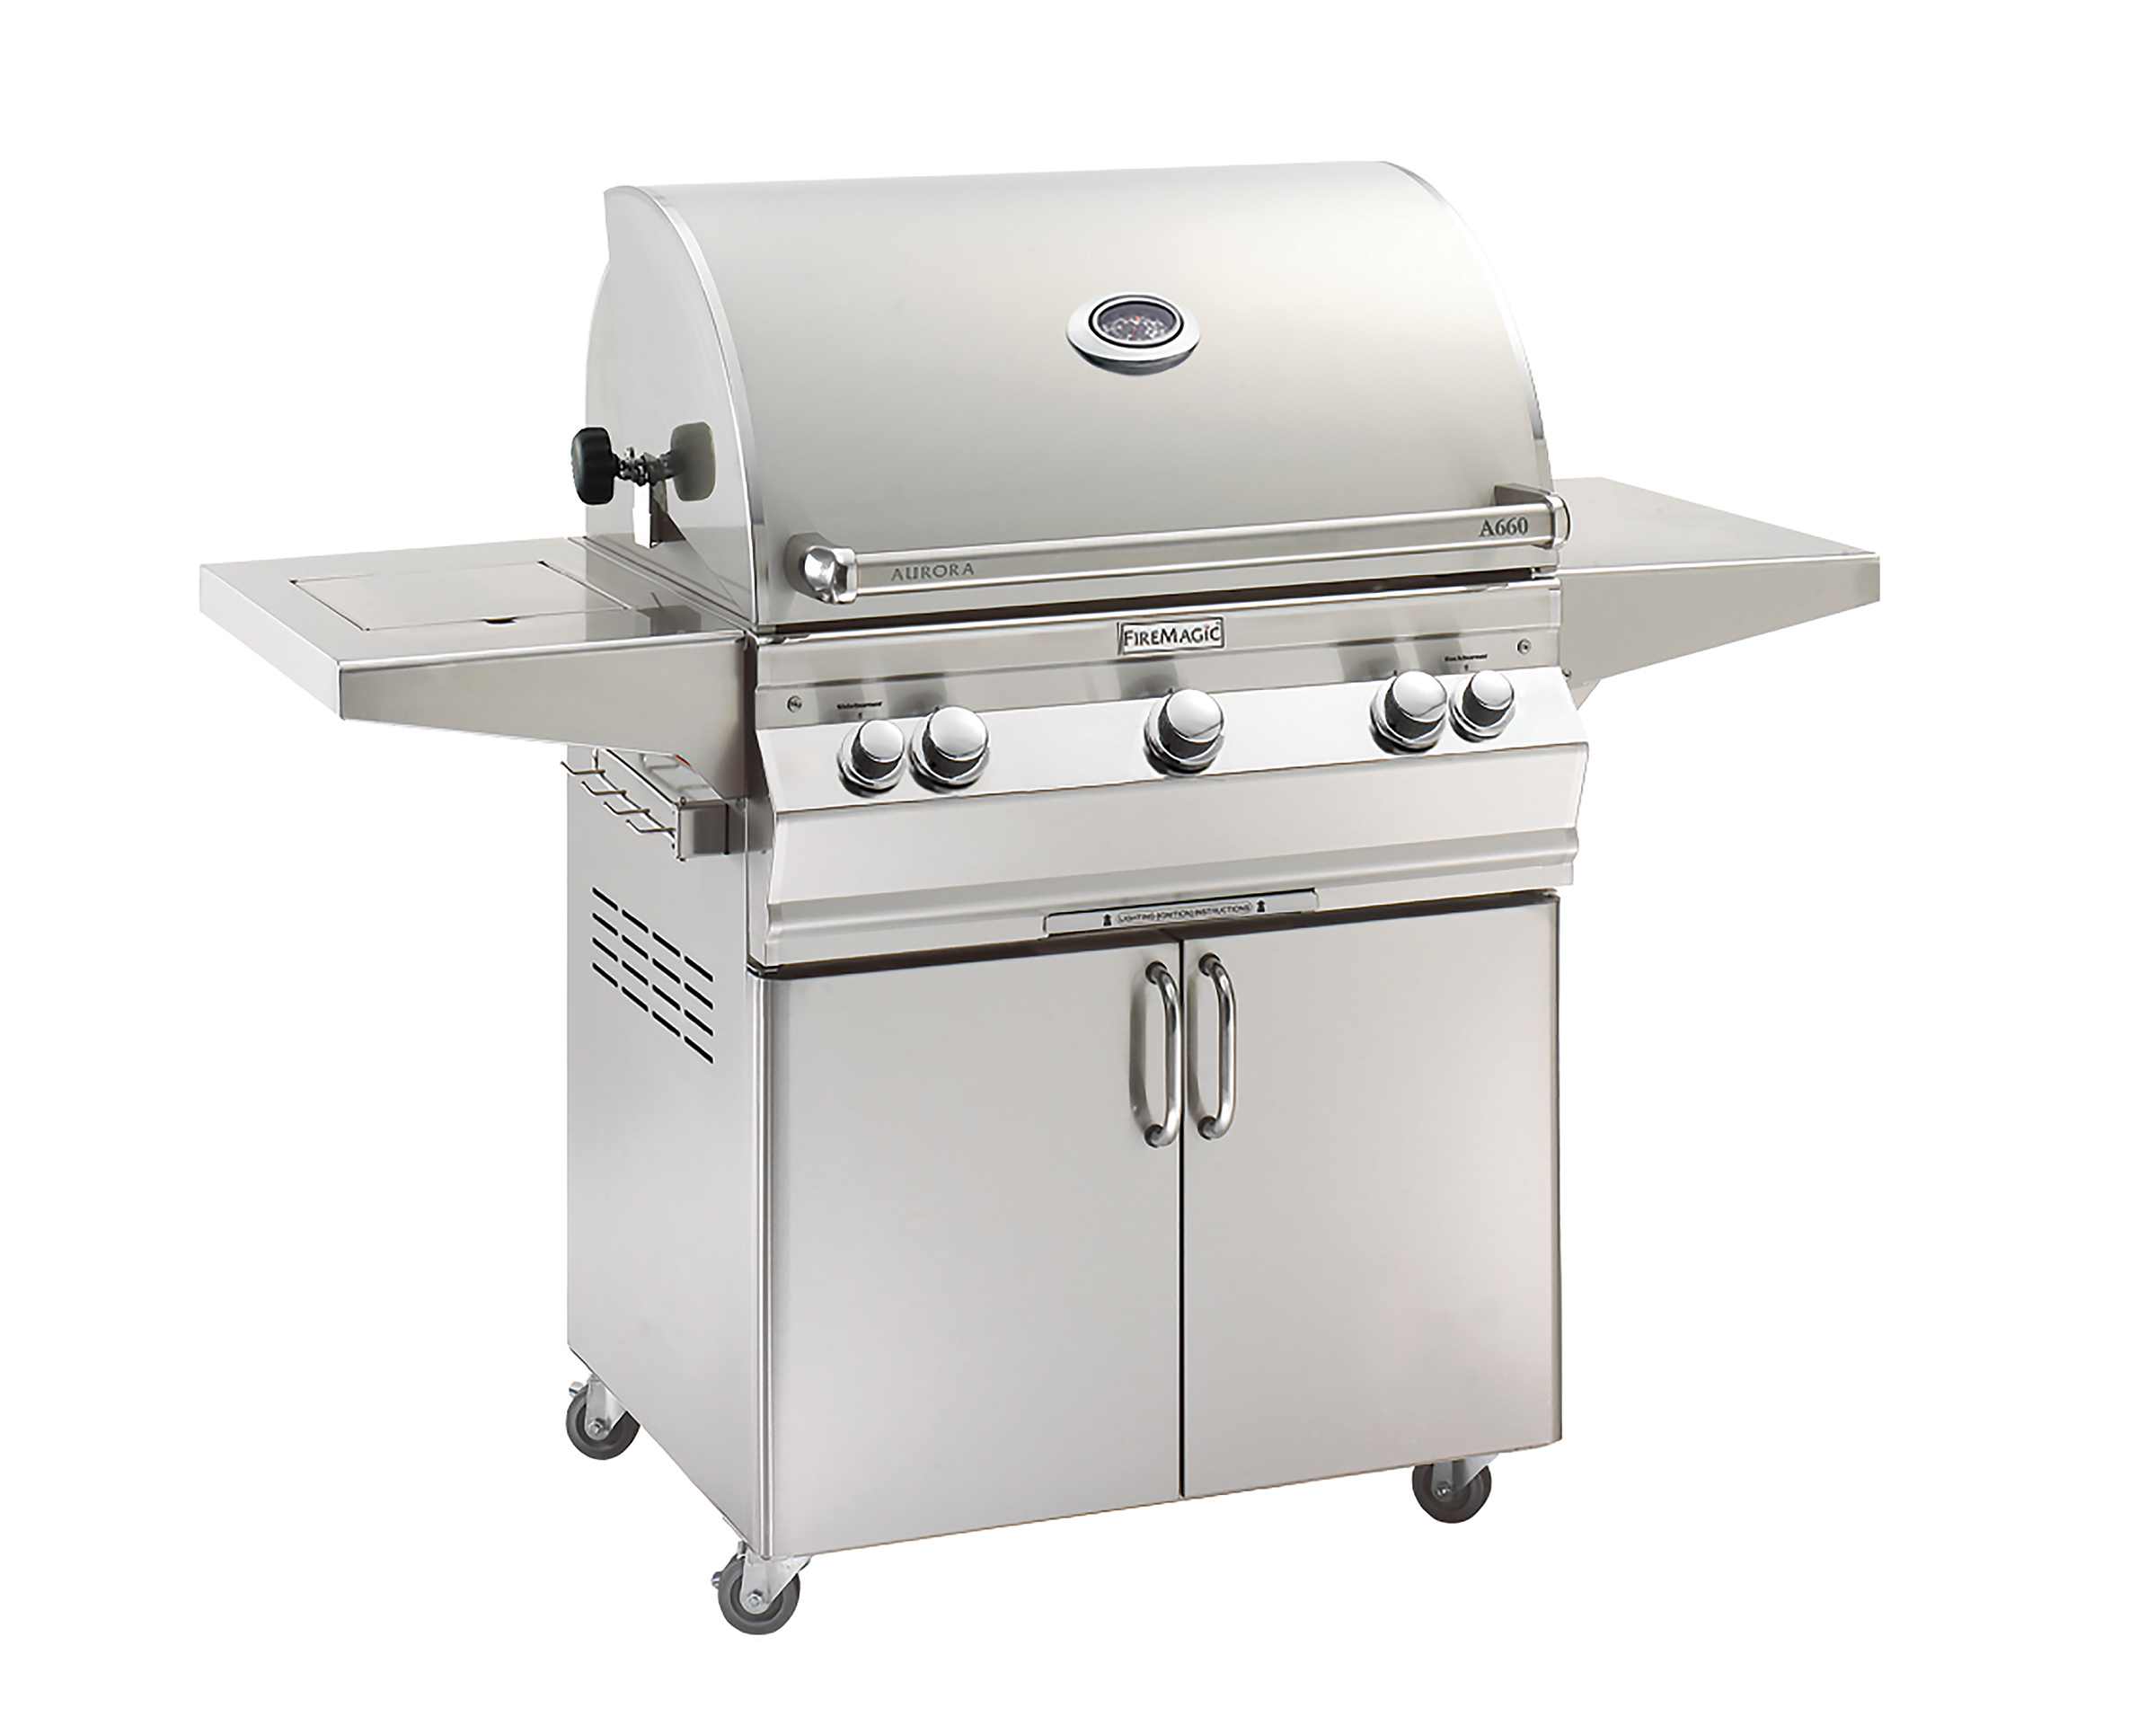 fm-a660s-aurora-analog-portable-grill.jpg